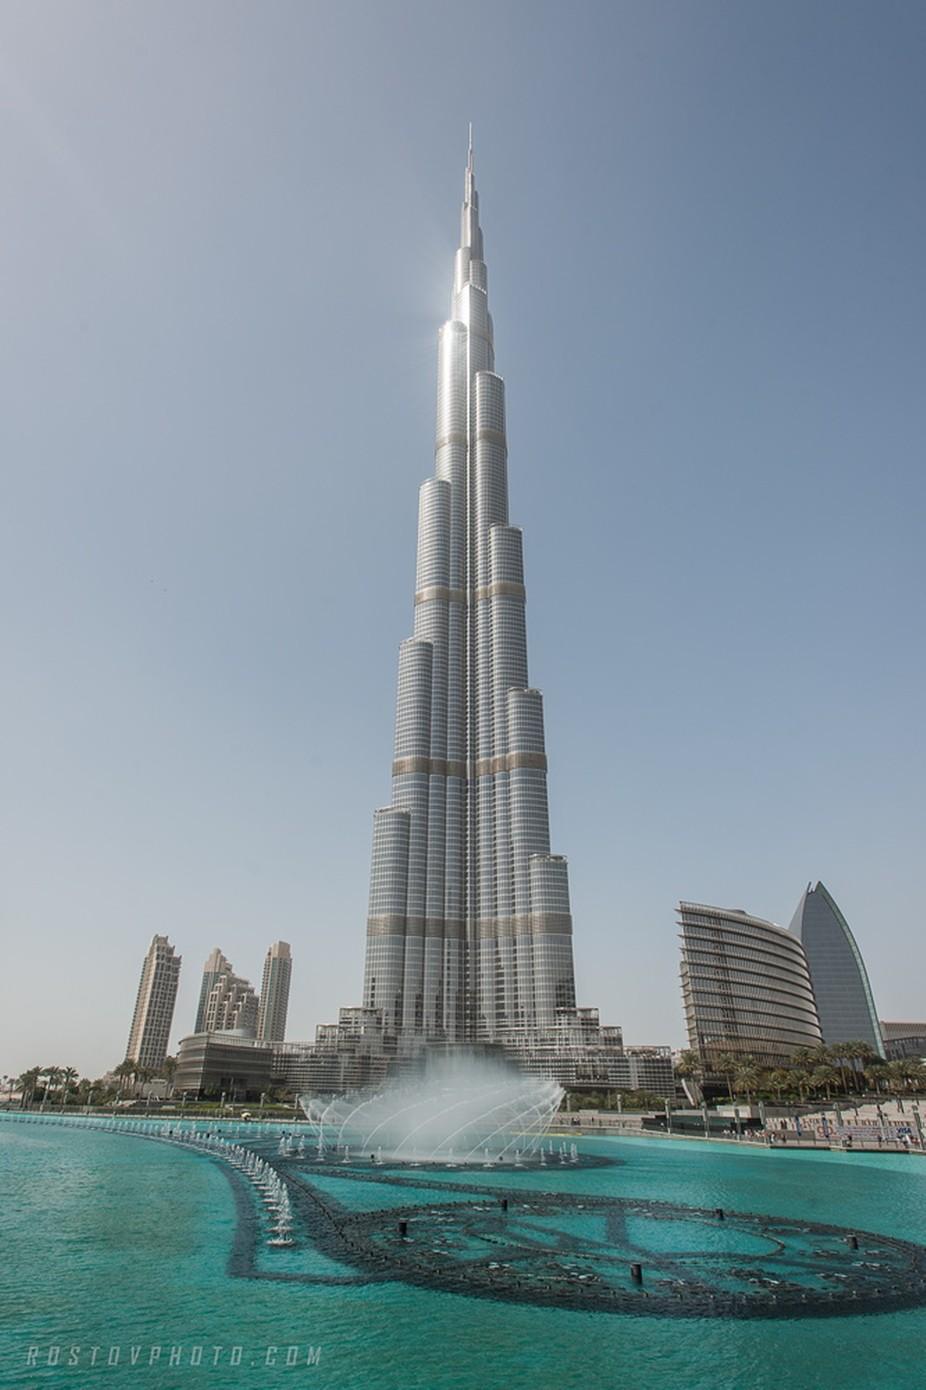 Dubai by Rostovskiy - Large Photo Contest